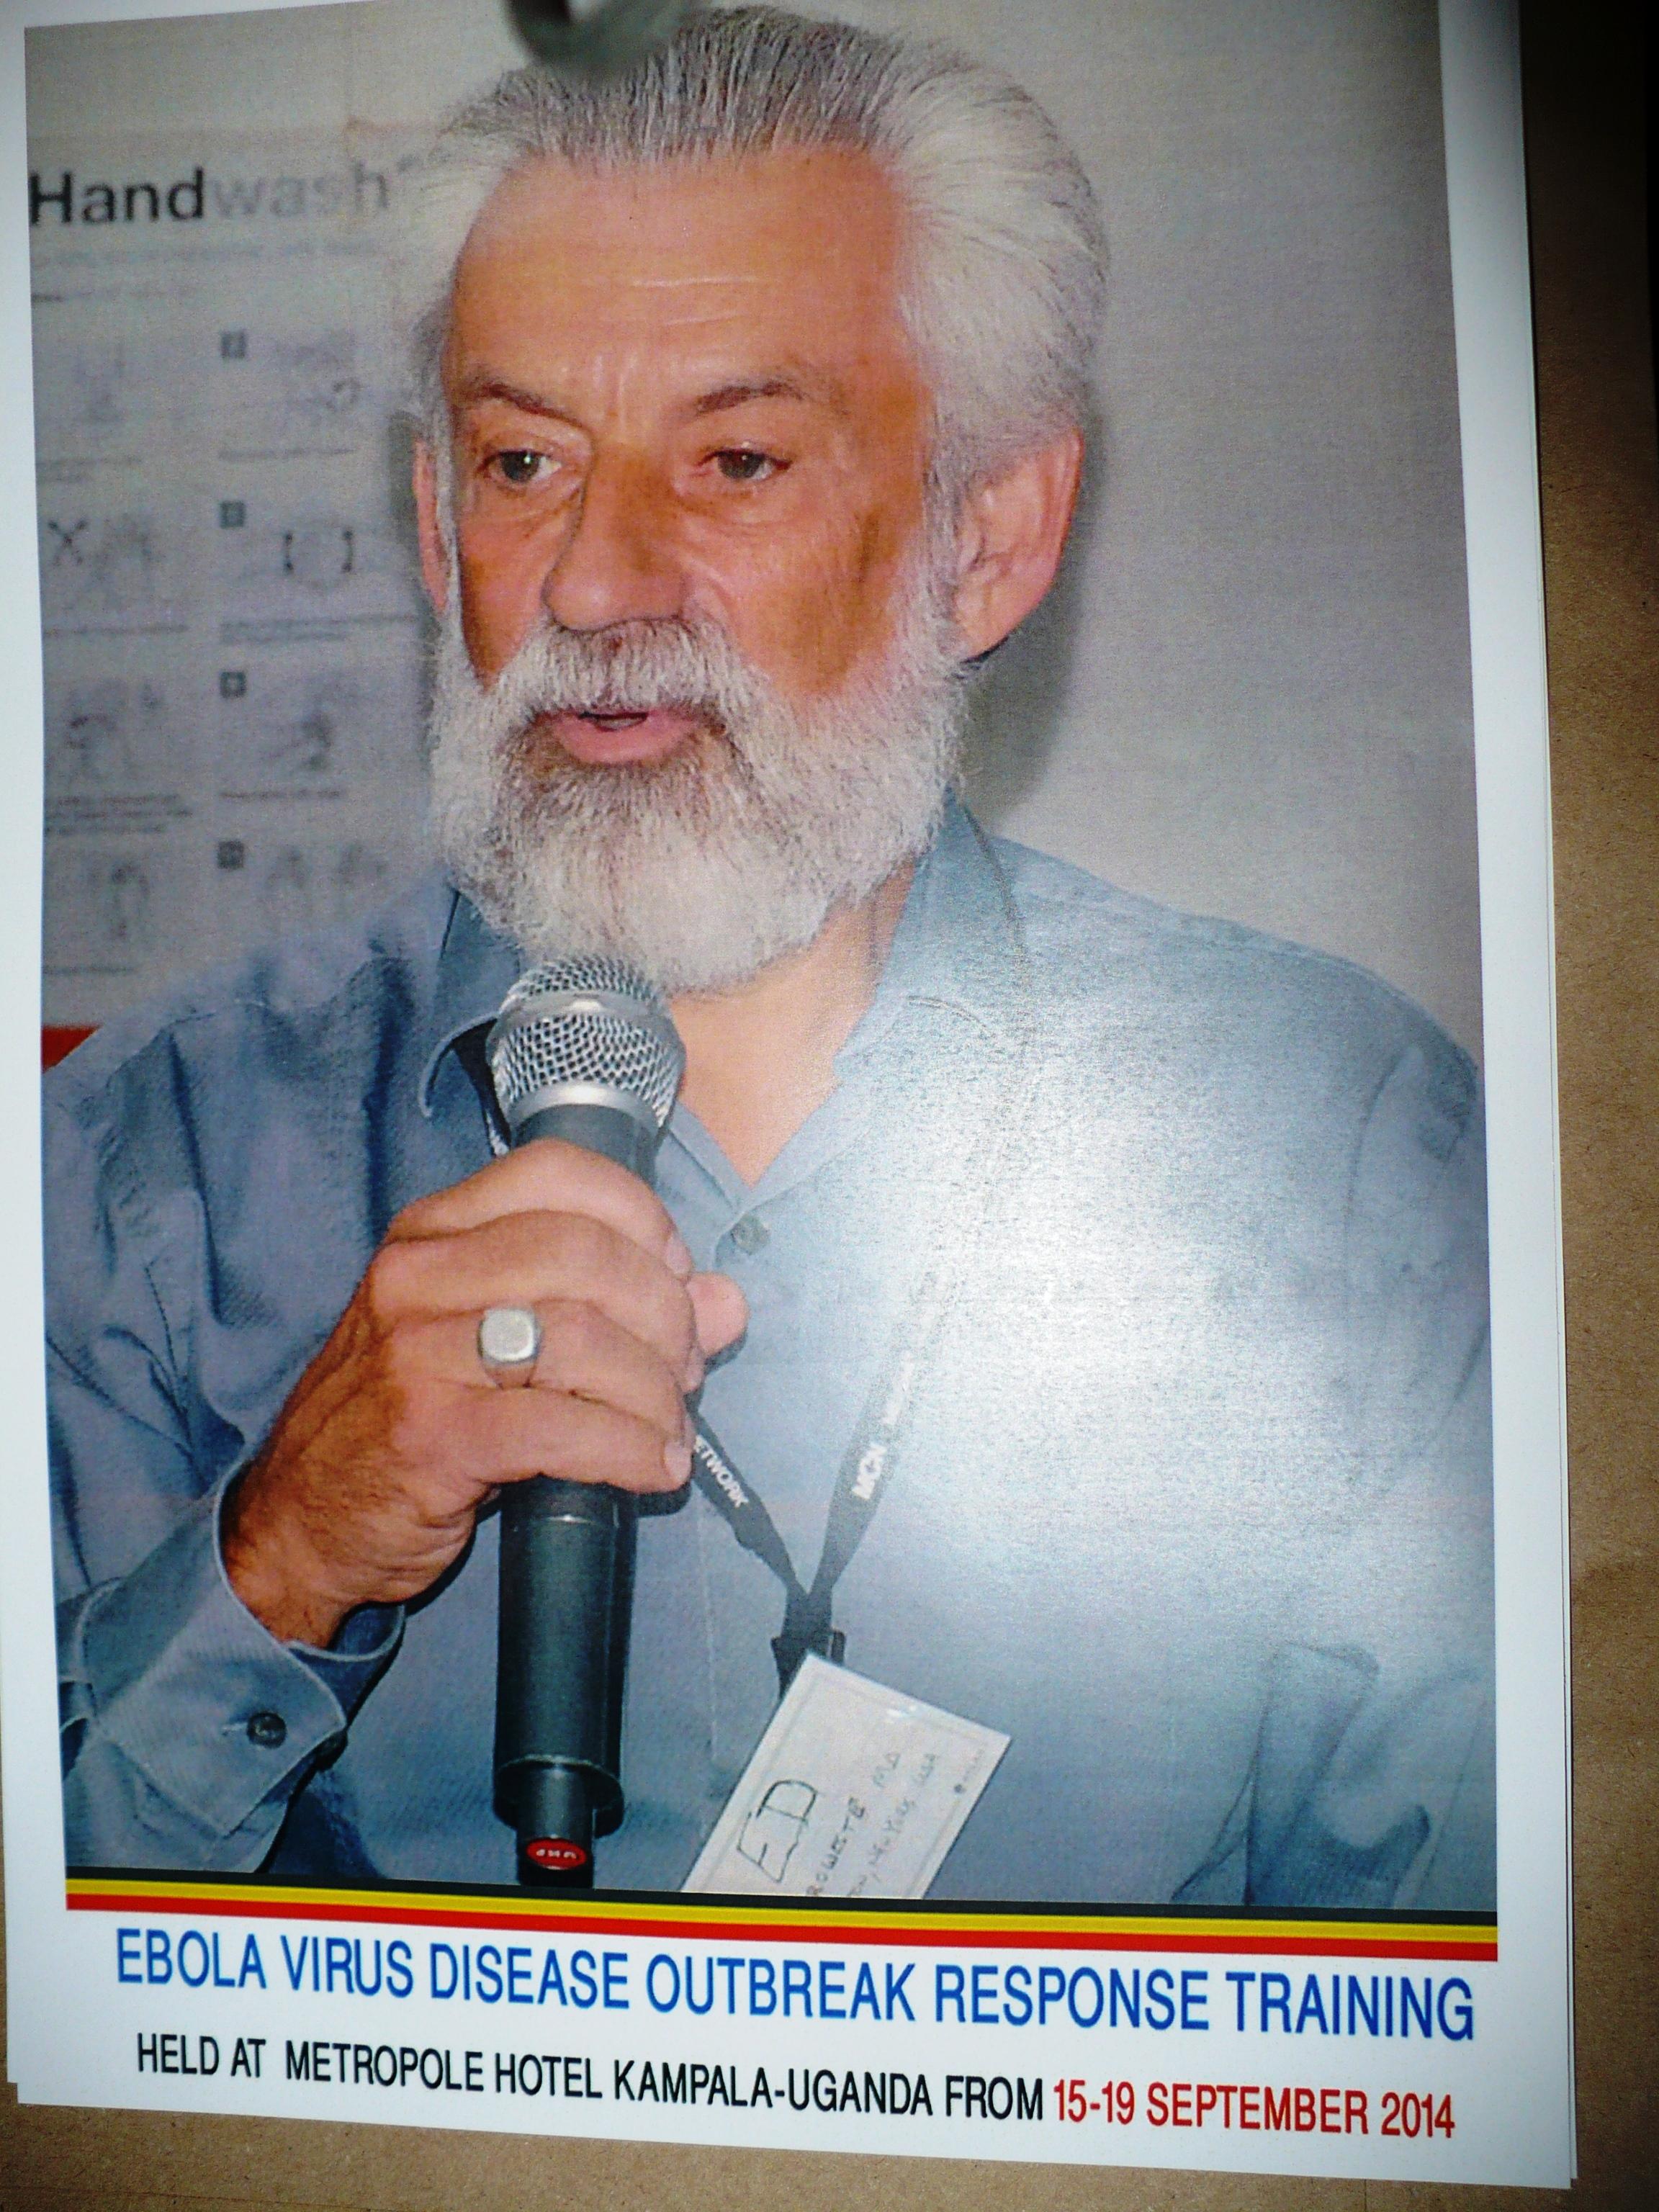 Ed Zuroweste training in Uganda